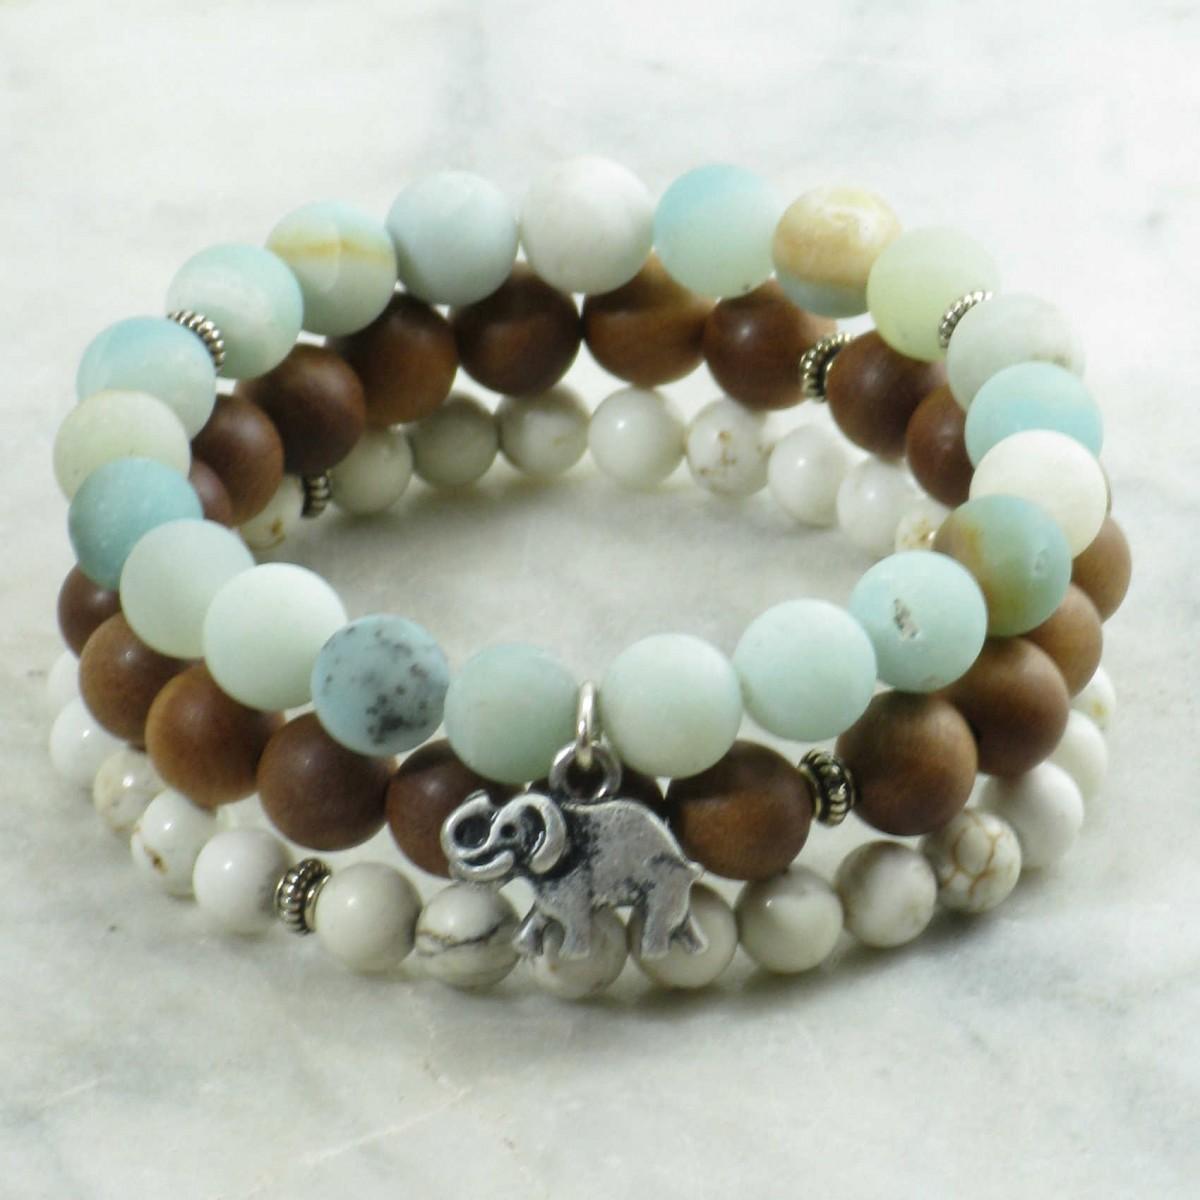 Airavata_Mala_Beads_21_Amazonite_Sandalwood_Howlite_Mala_Beads_Buddhist_Prayer_Beads